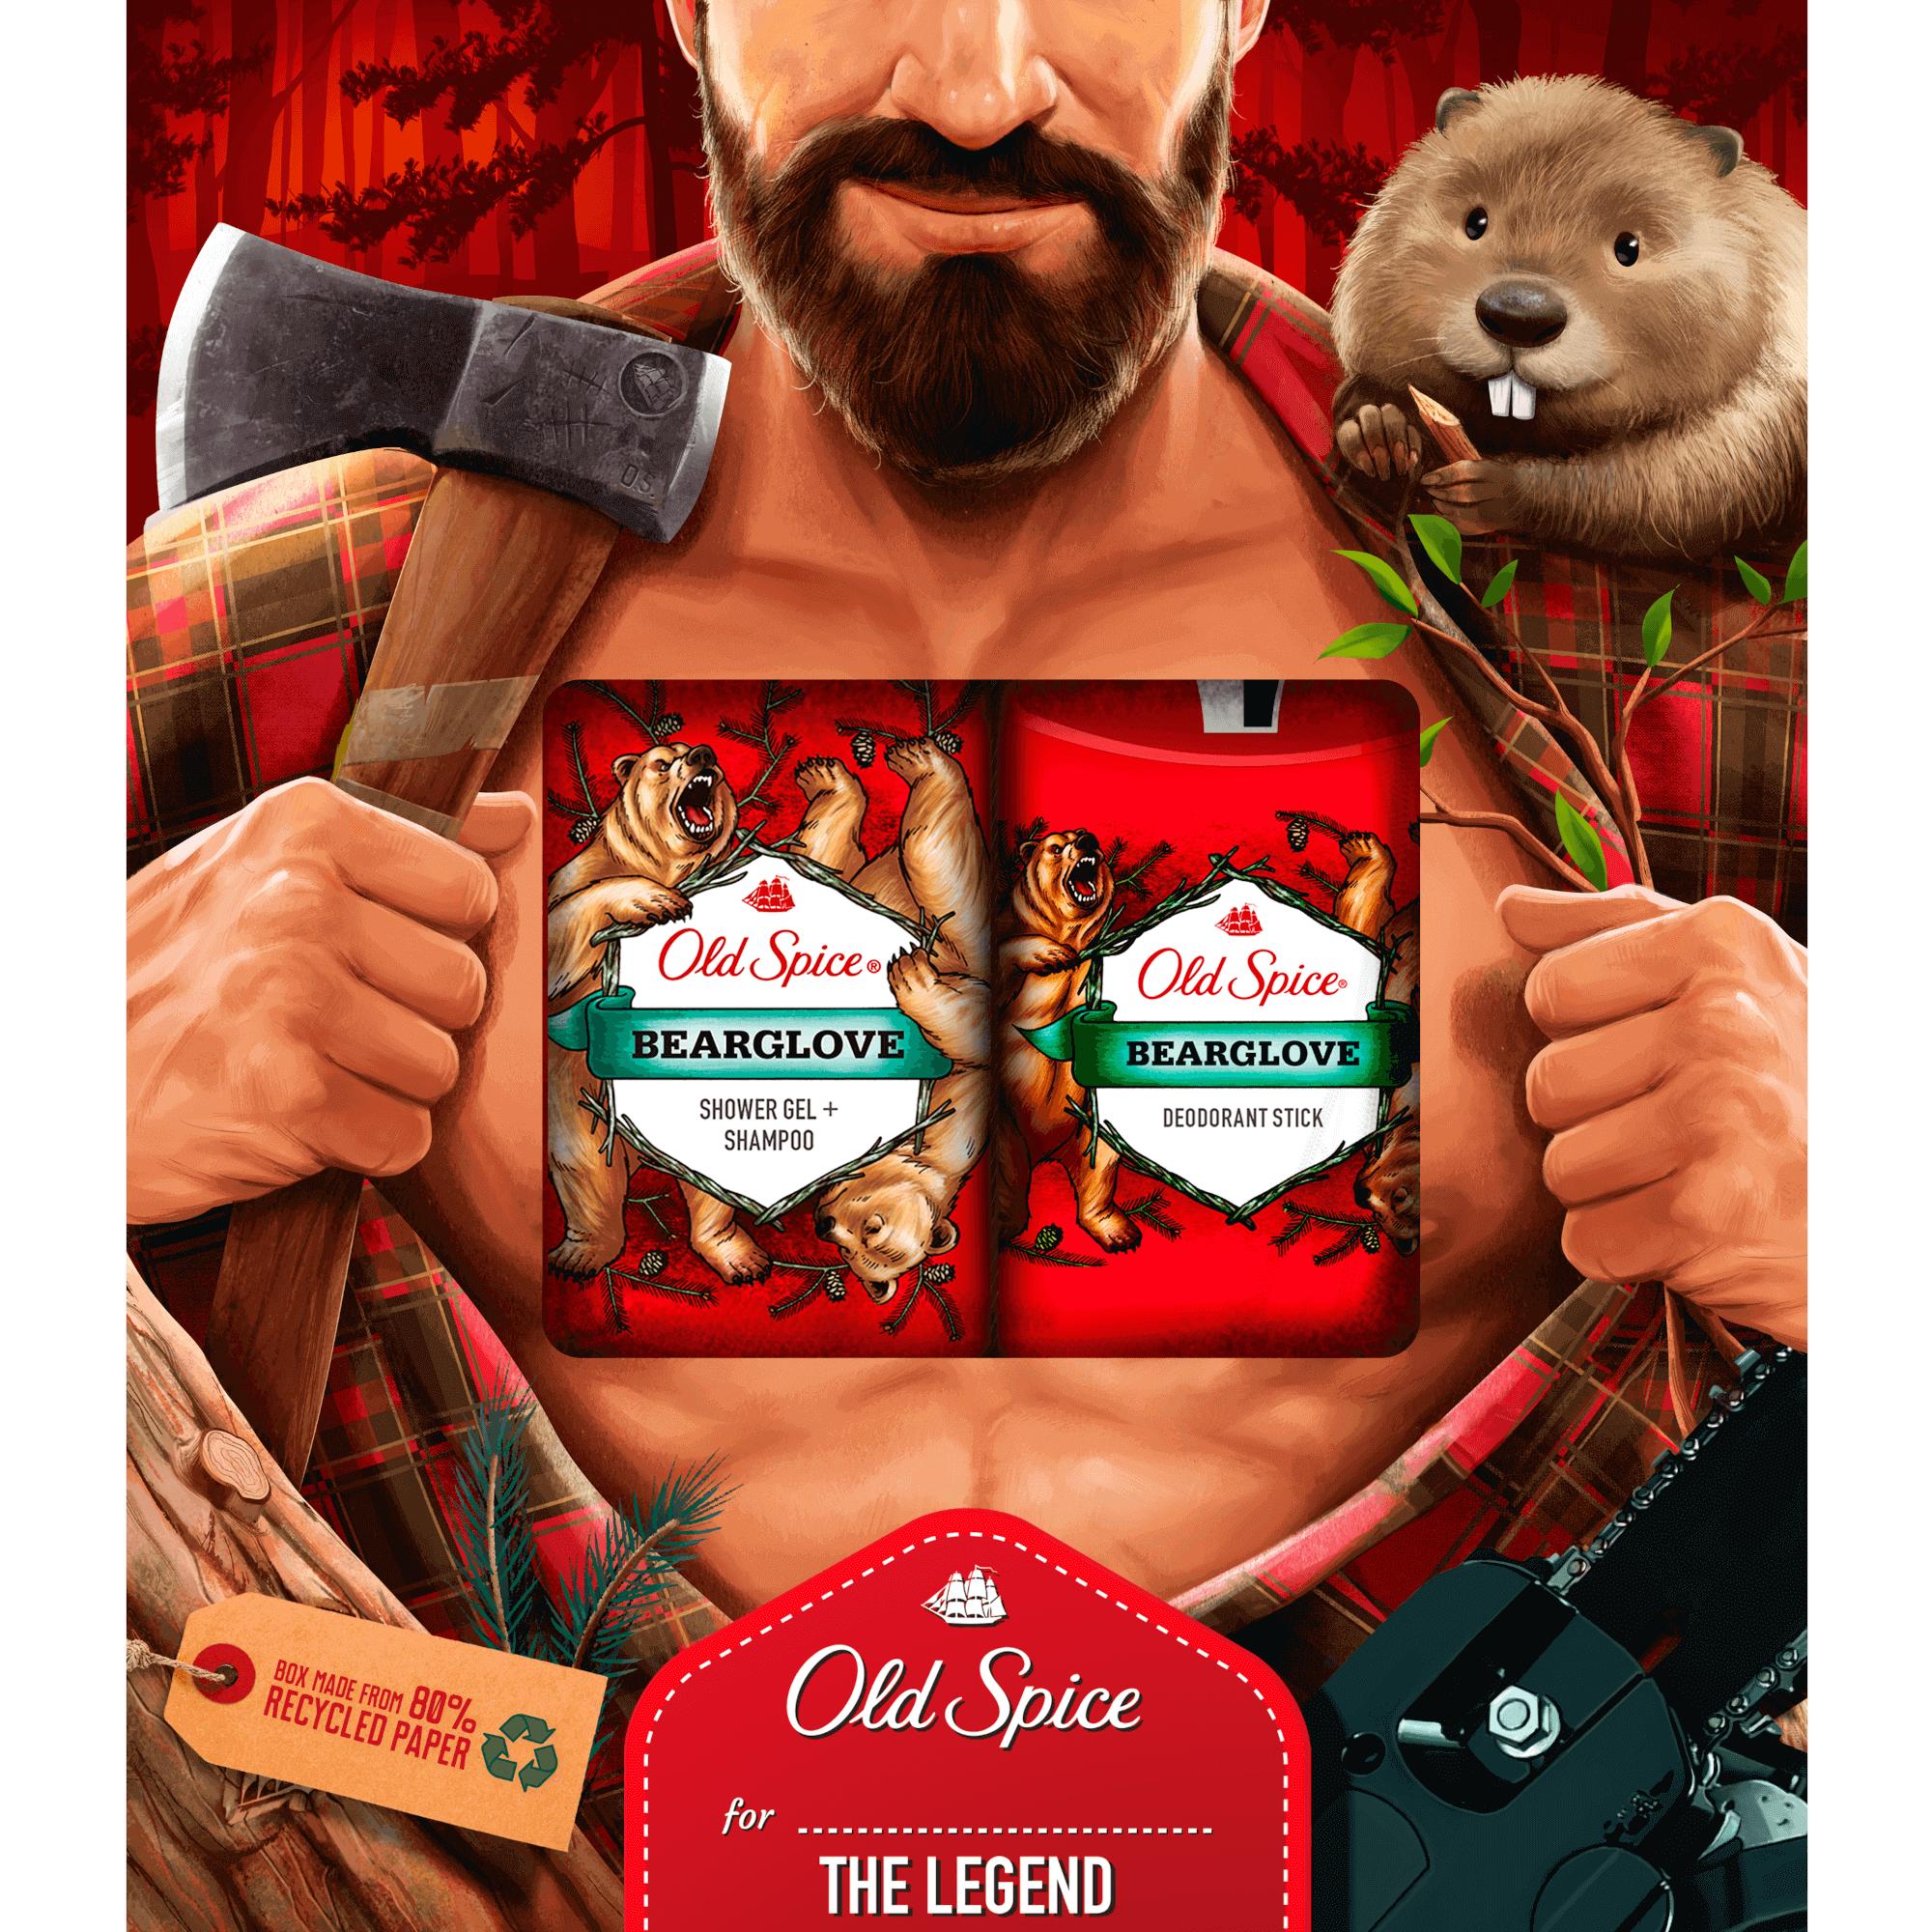 Vianočná sada Old Spice Bearglove Lumberjack